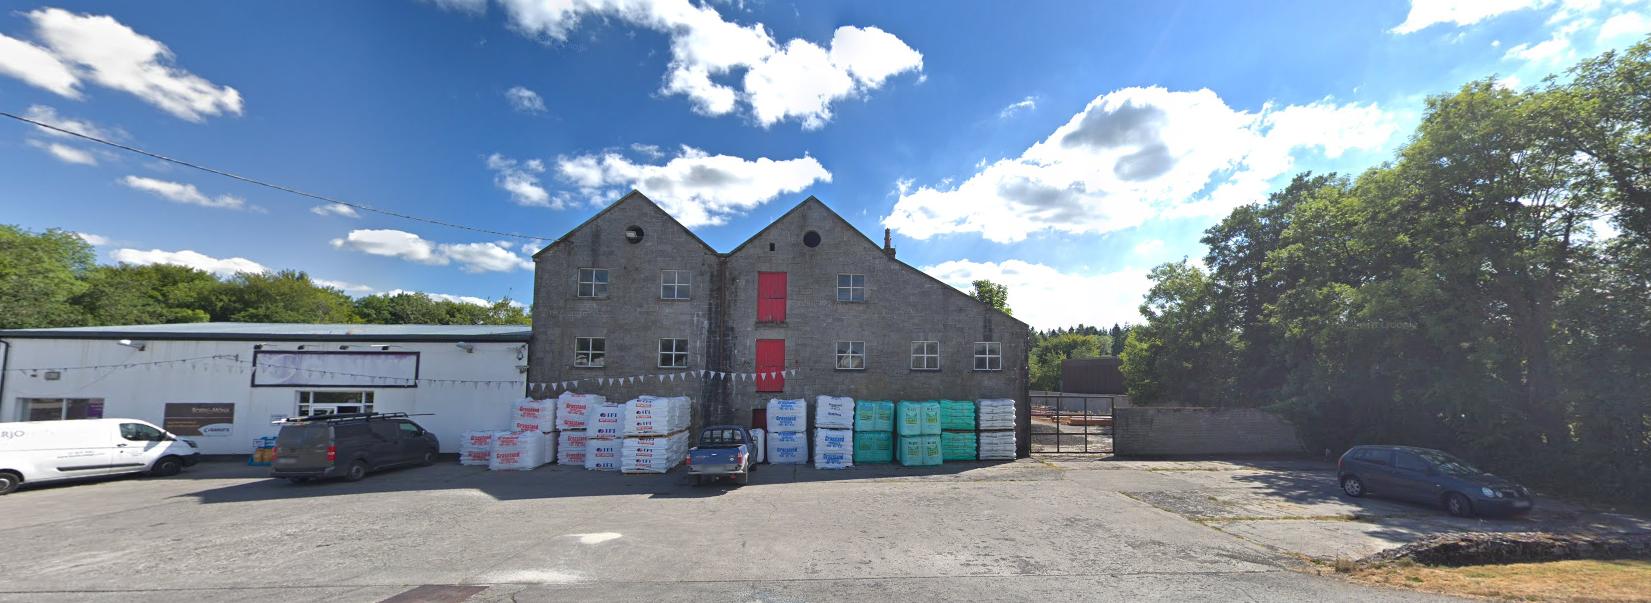 Mountbellew Demesne Mill in Galway - Visit Galway